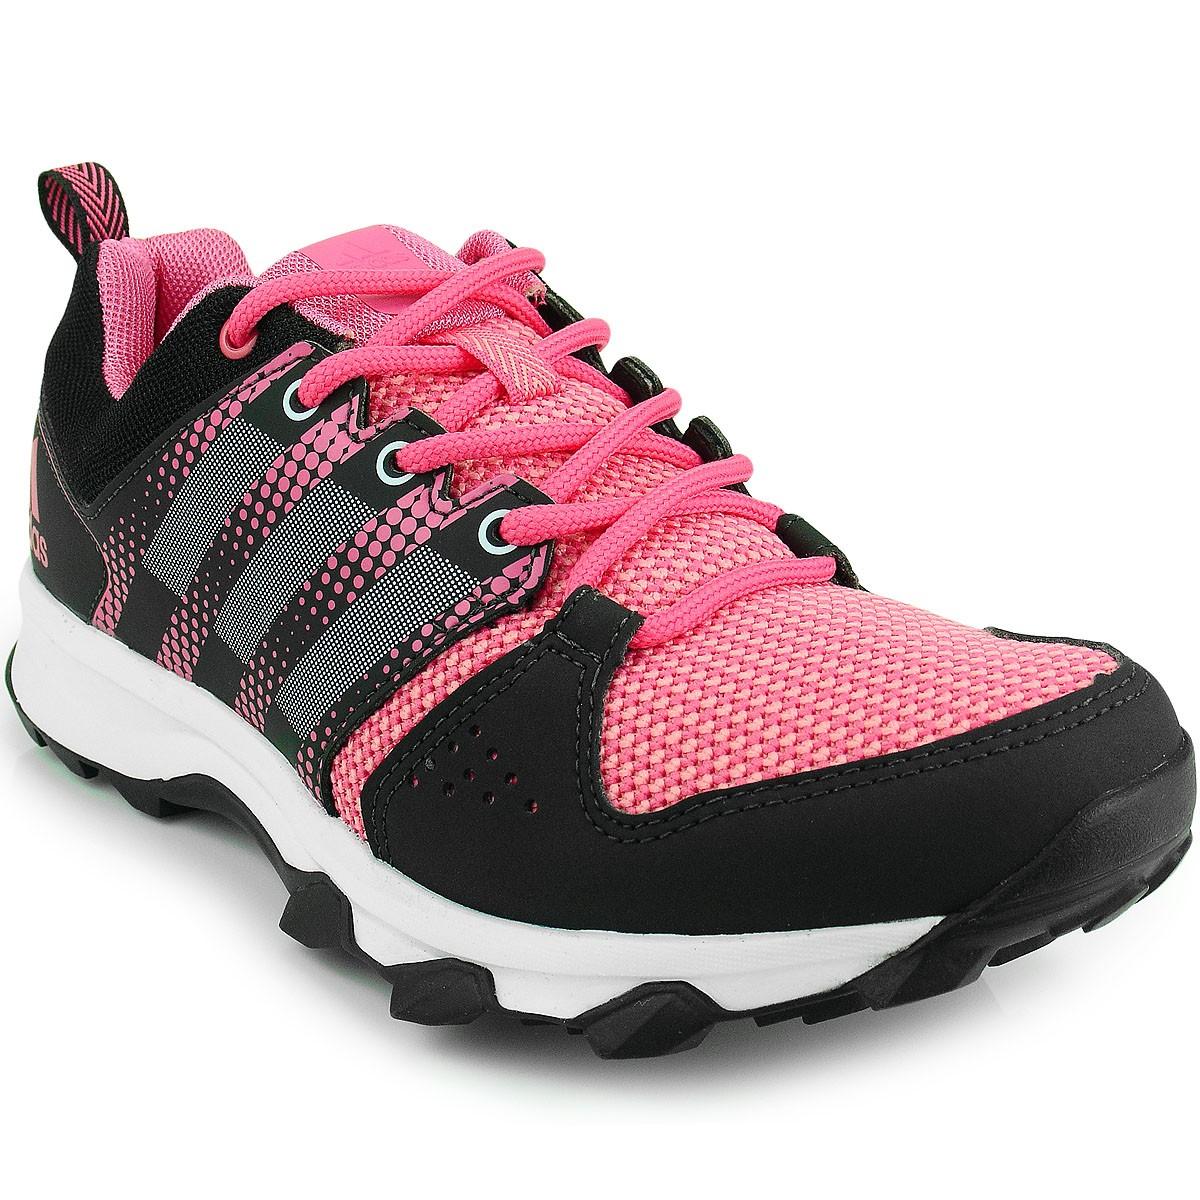 d895112953 Tênis Adidas Galaxy Trail W